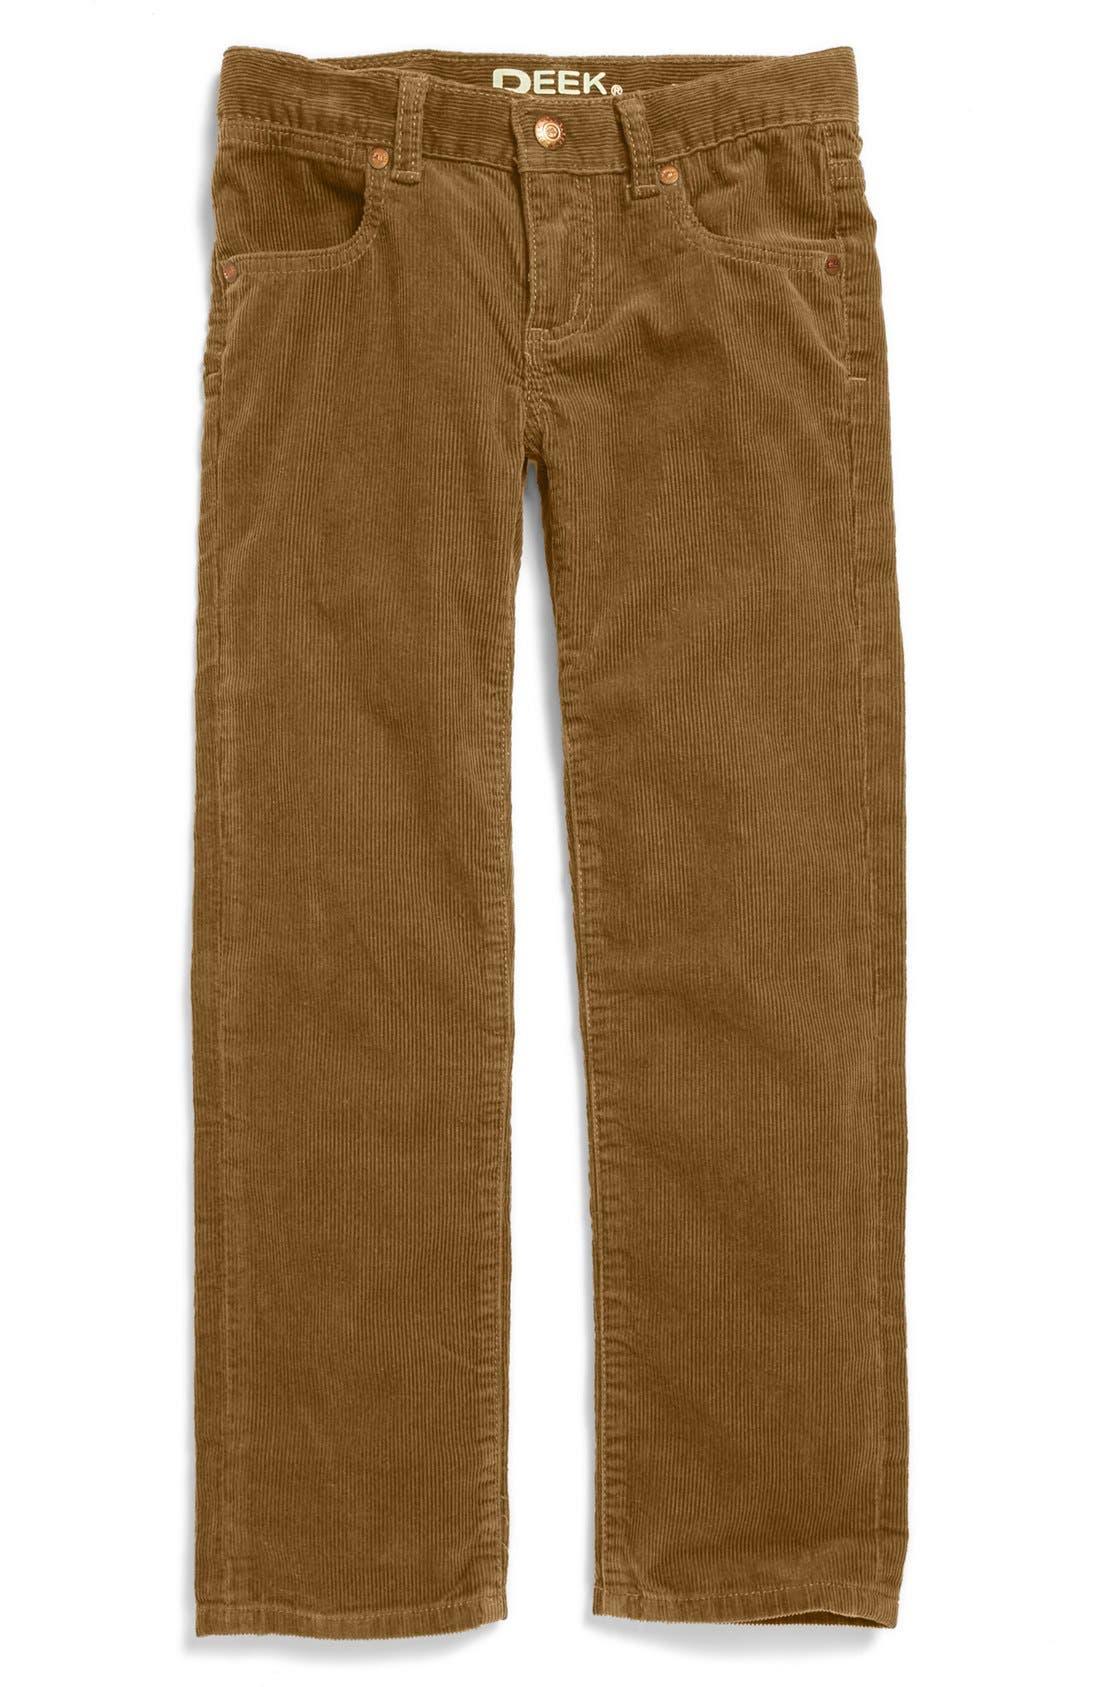 Alternate Image 1 Selected - Peek 'Ellis' Slim Corduroy Pants (Toddler Boys, Little Boys & Big Boys)